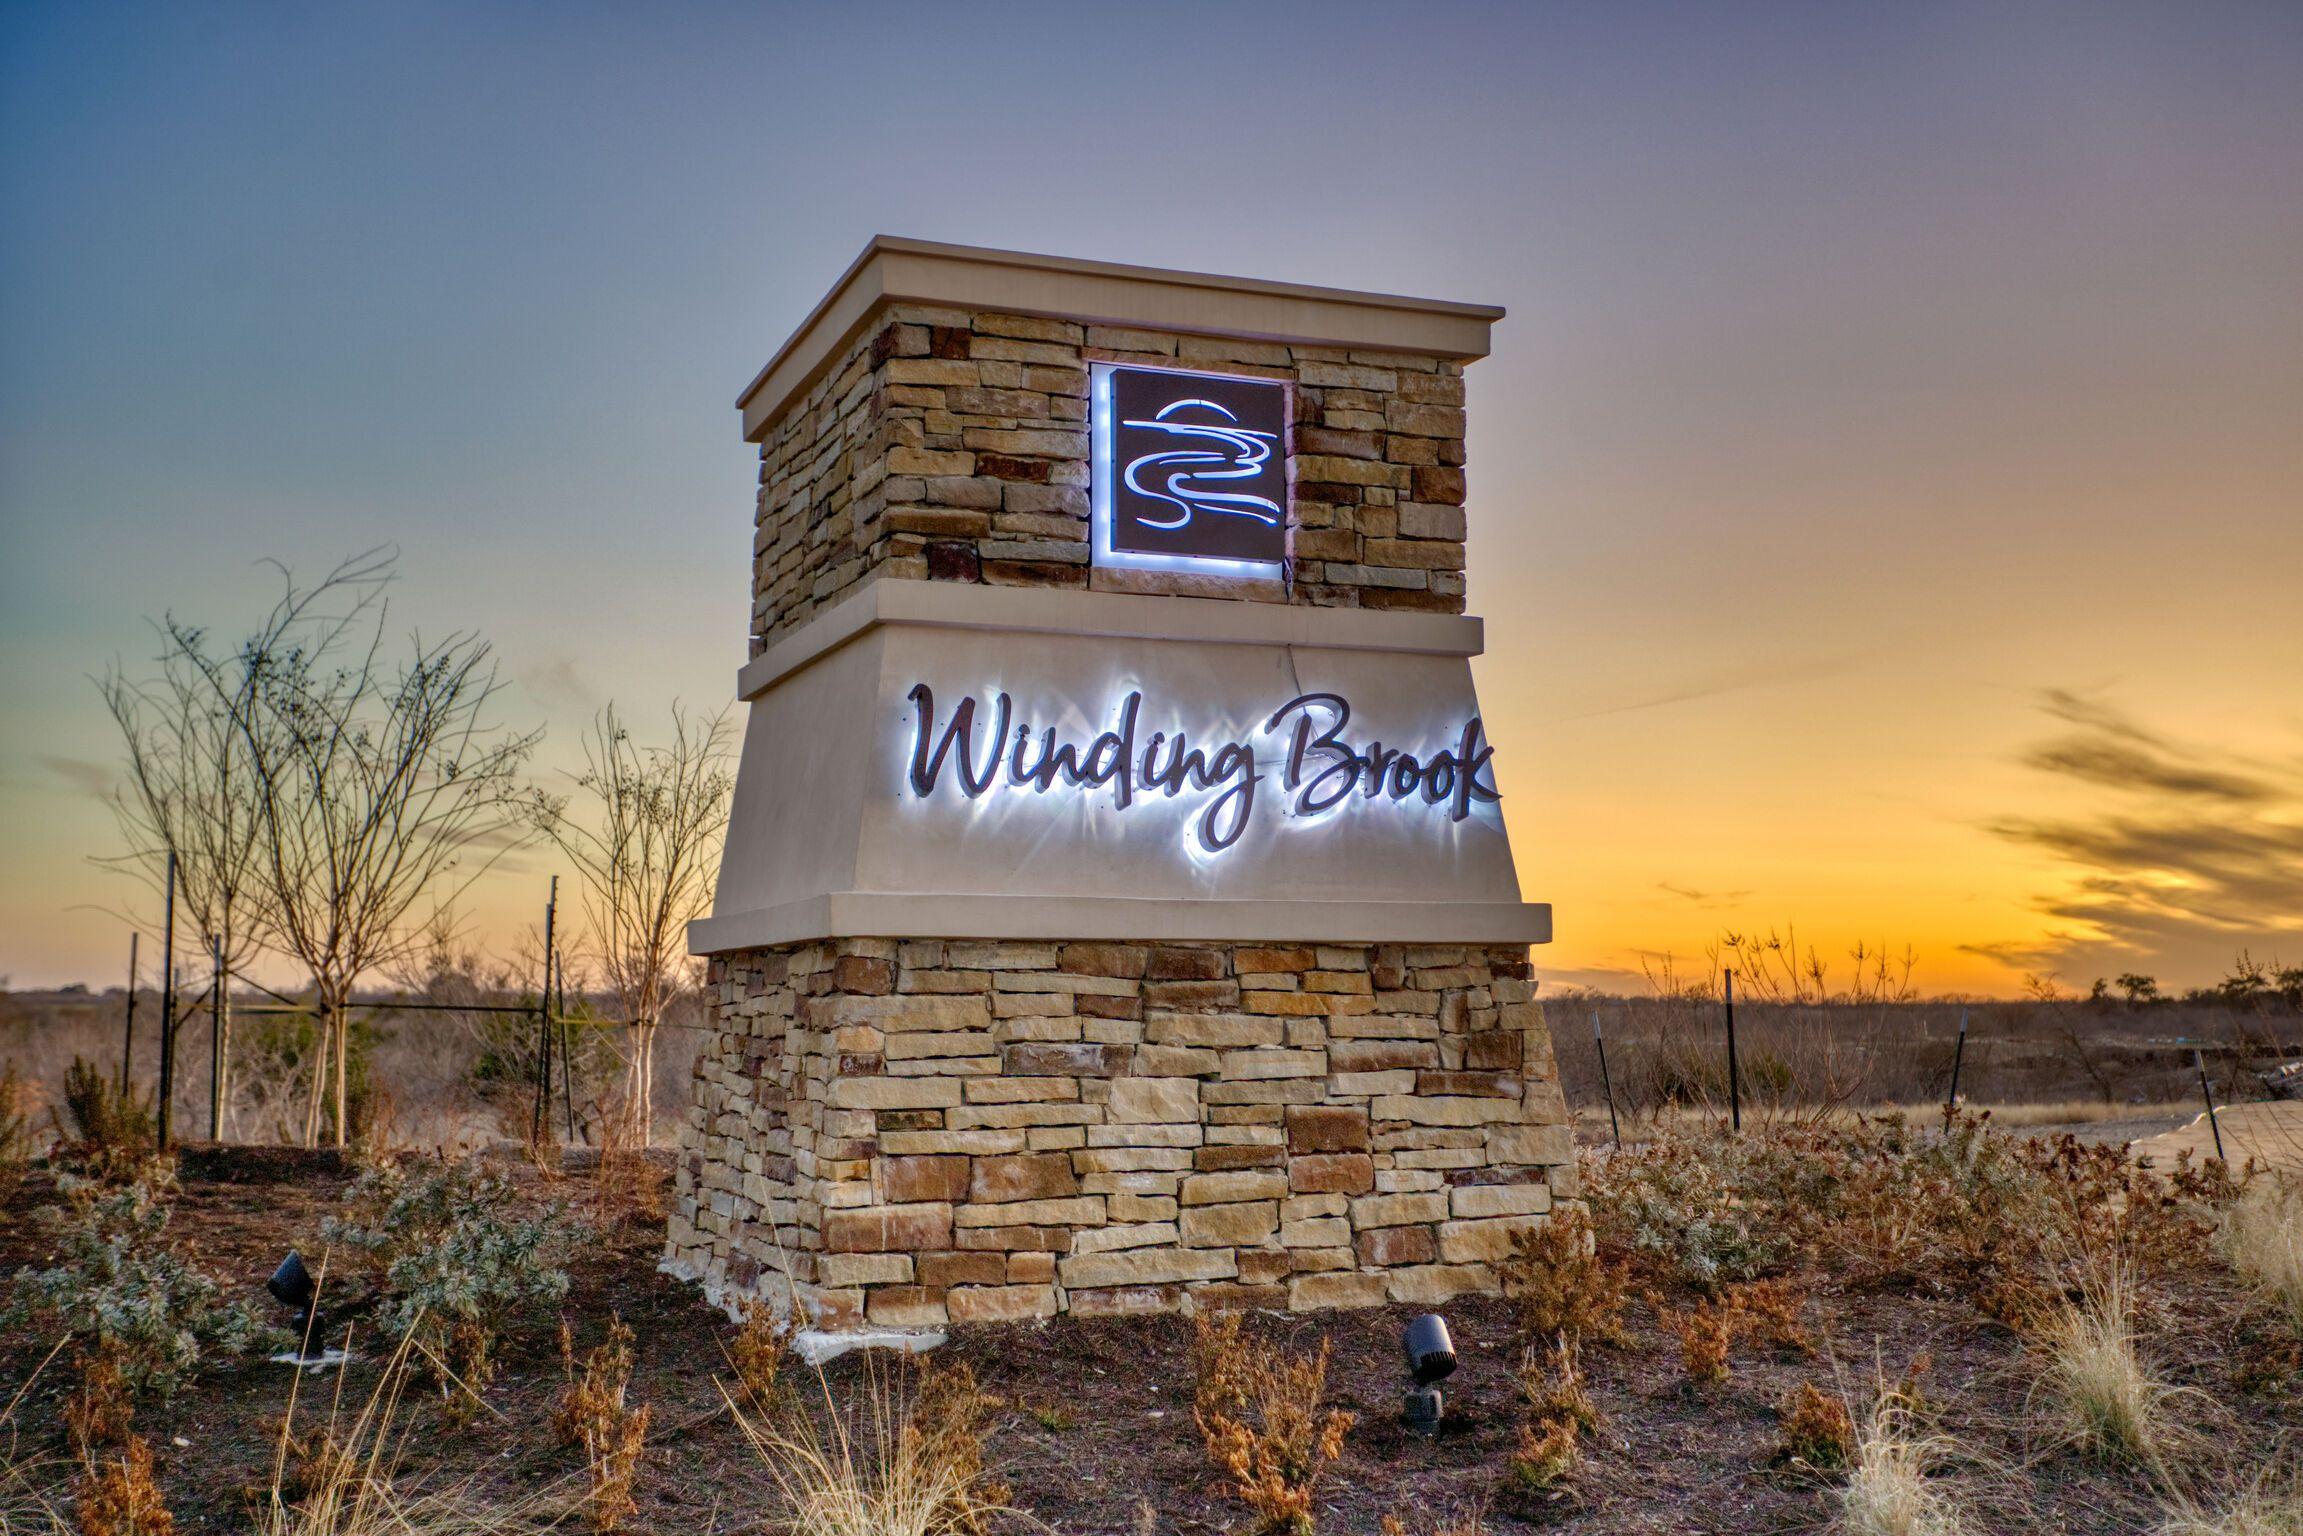 'Winding Brook' by M/I Homes-San Antonio in San Antonio